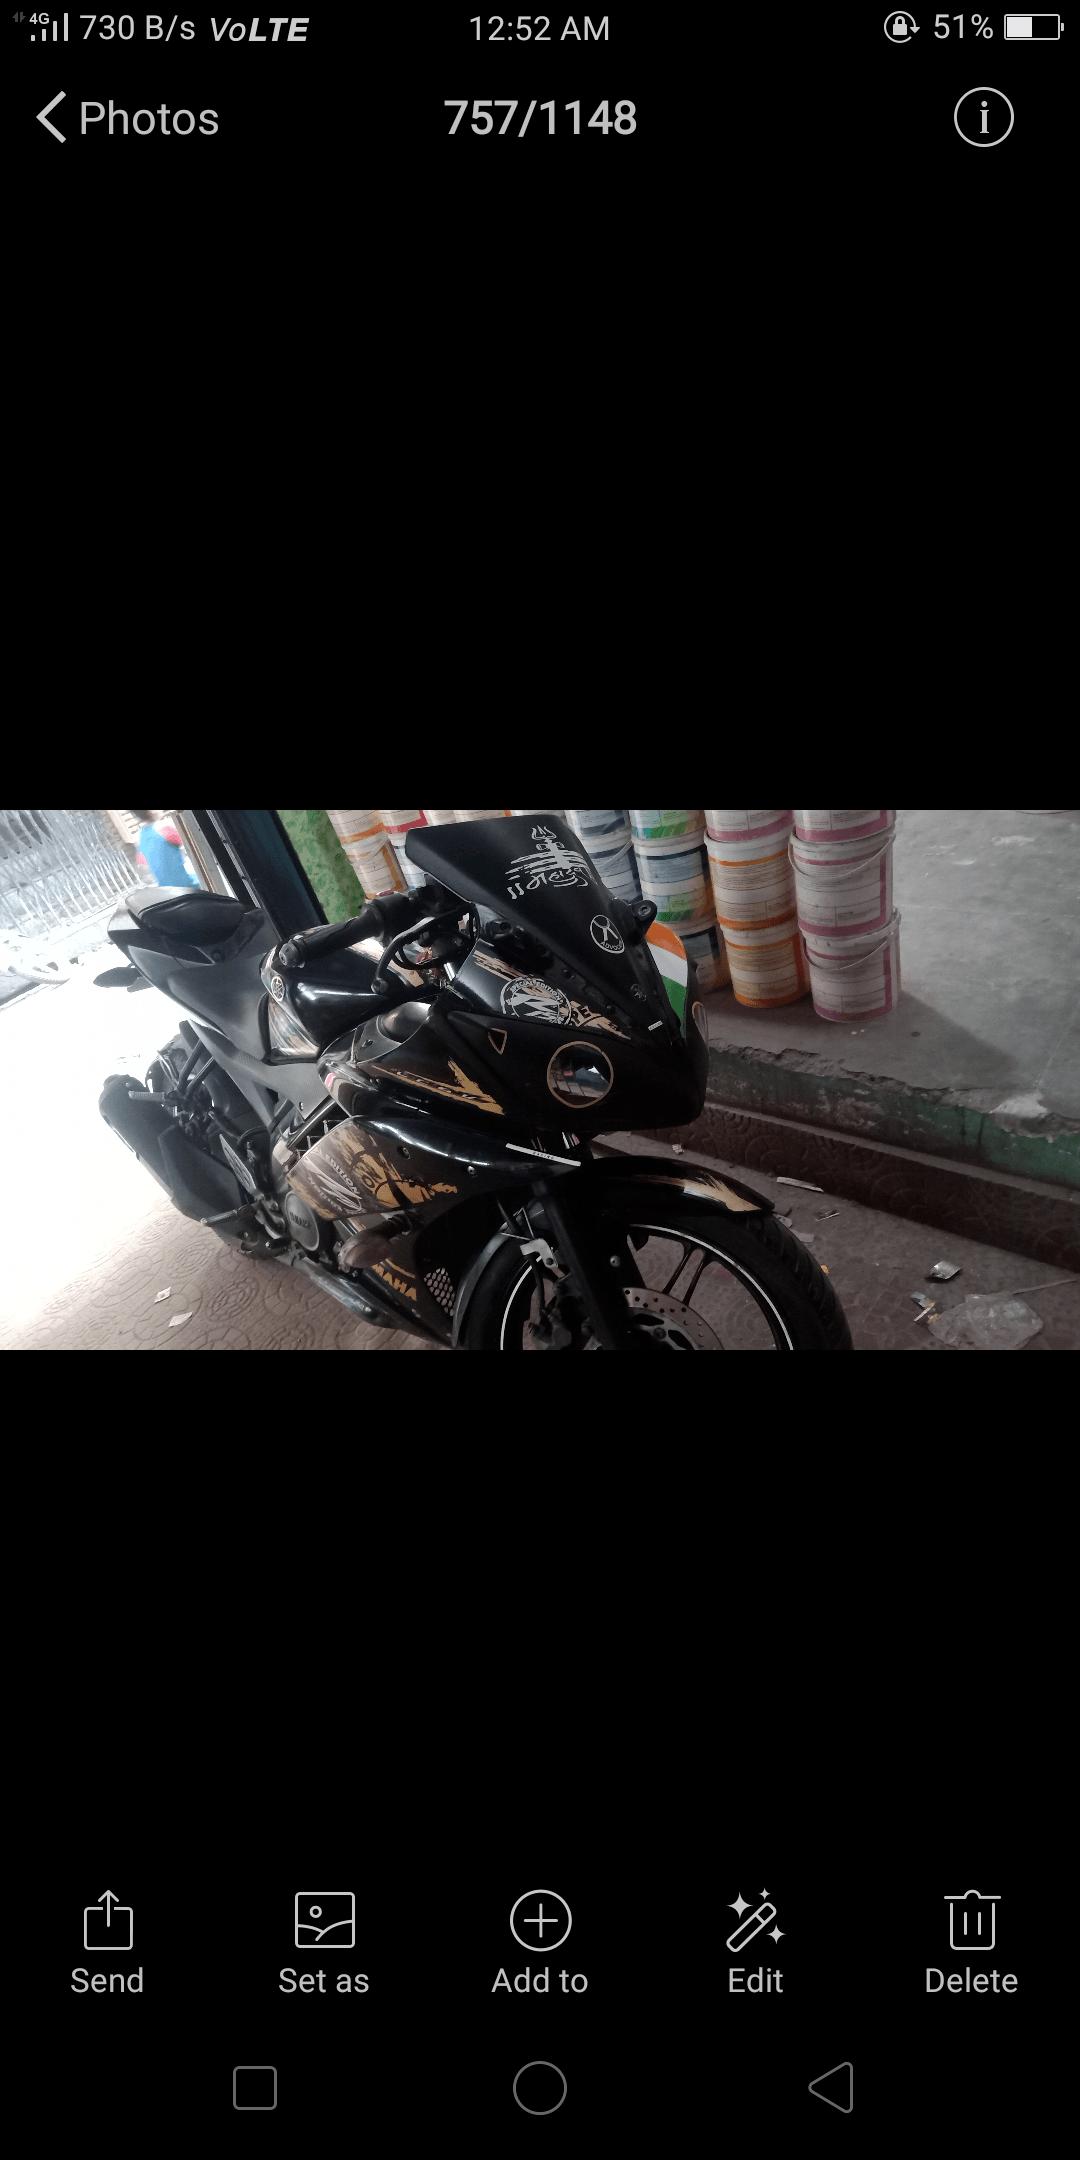 Yamaha Yzf R15 V20 Rear View